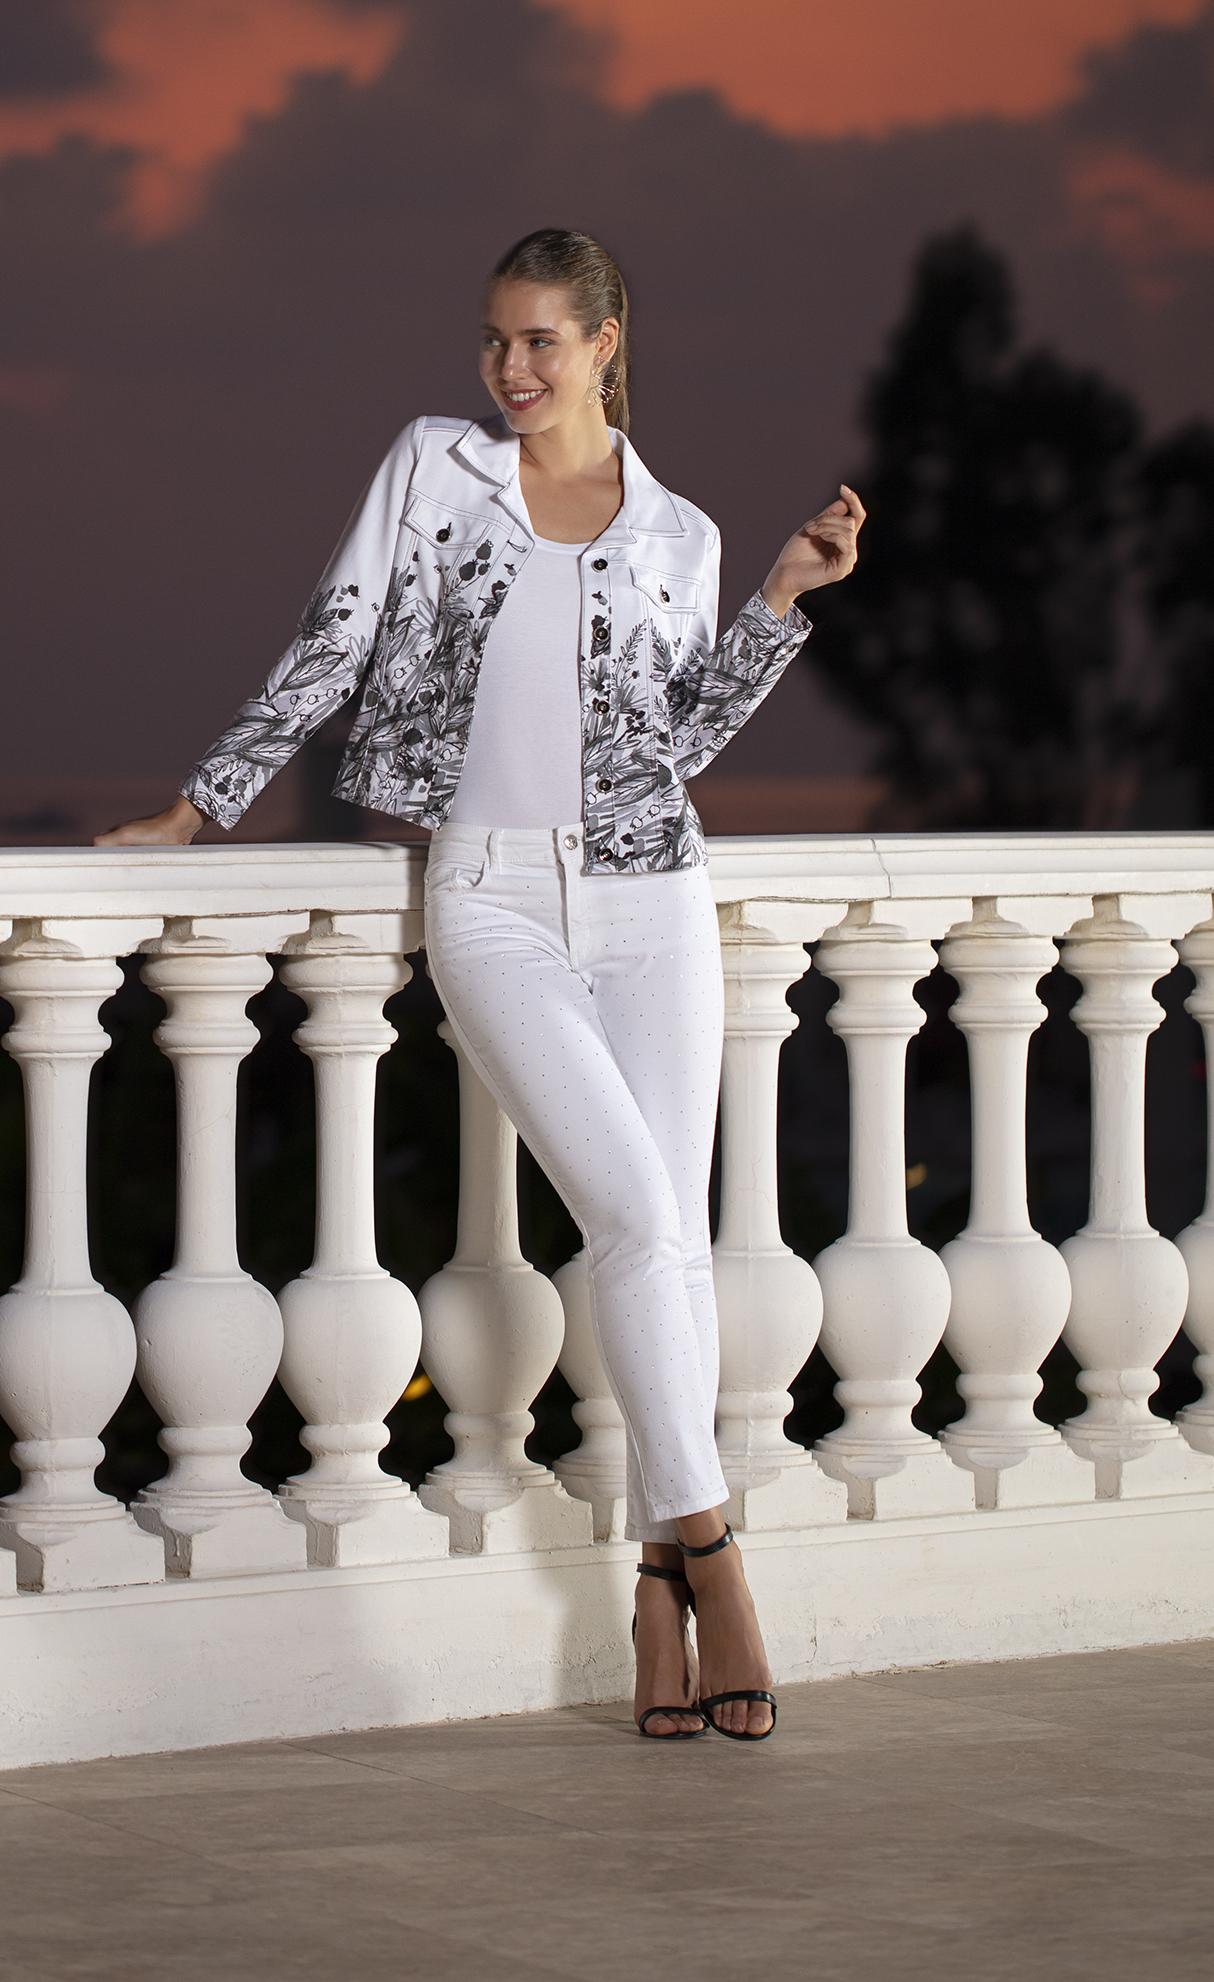 Simply Art Dolcezza: Wild Flowers In Black & White Abstract Art Soft Denim Jacket (1 Left!)